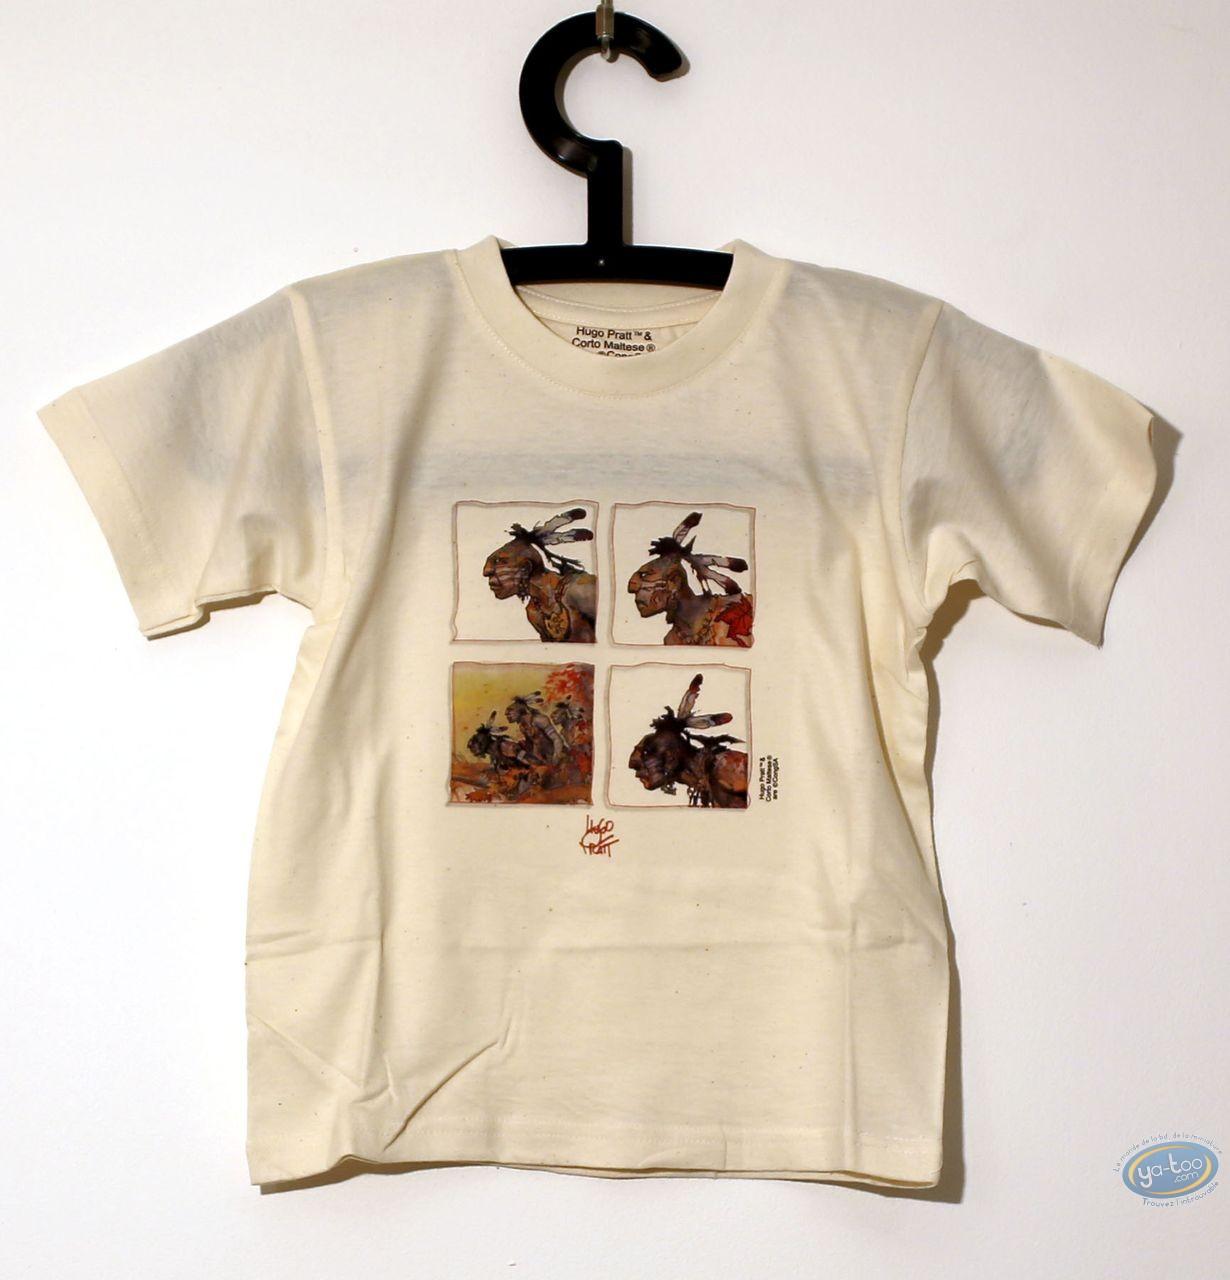 Clothes, Corto Maltese : T-shirt, Corto Maltese : Kid 06/03 - 5/6 years